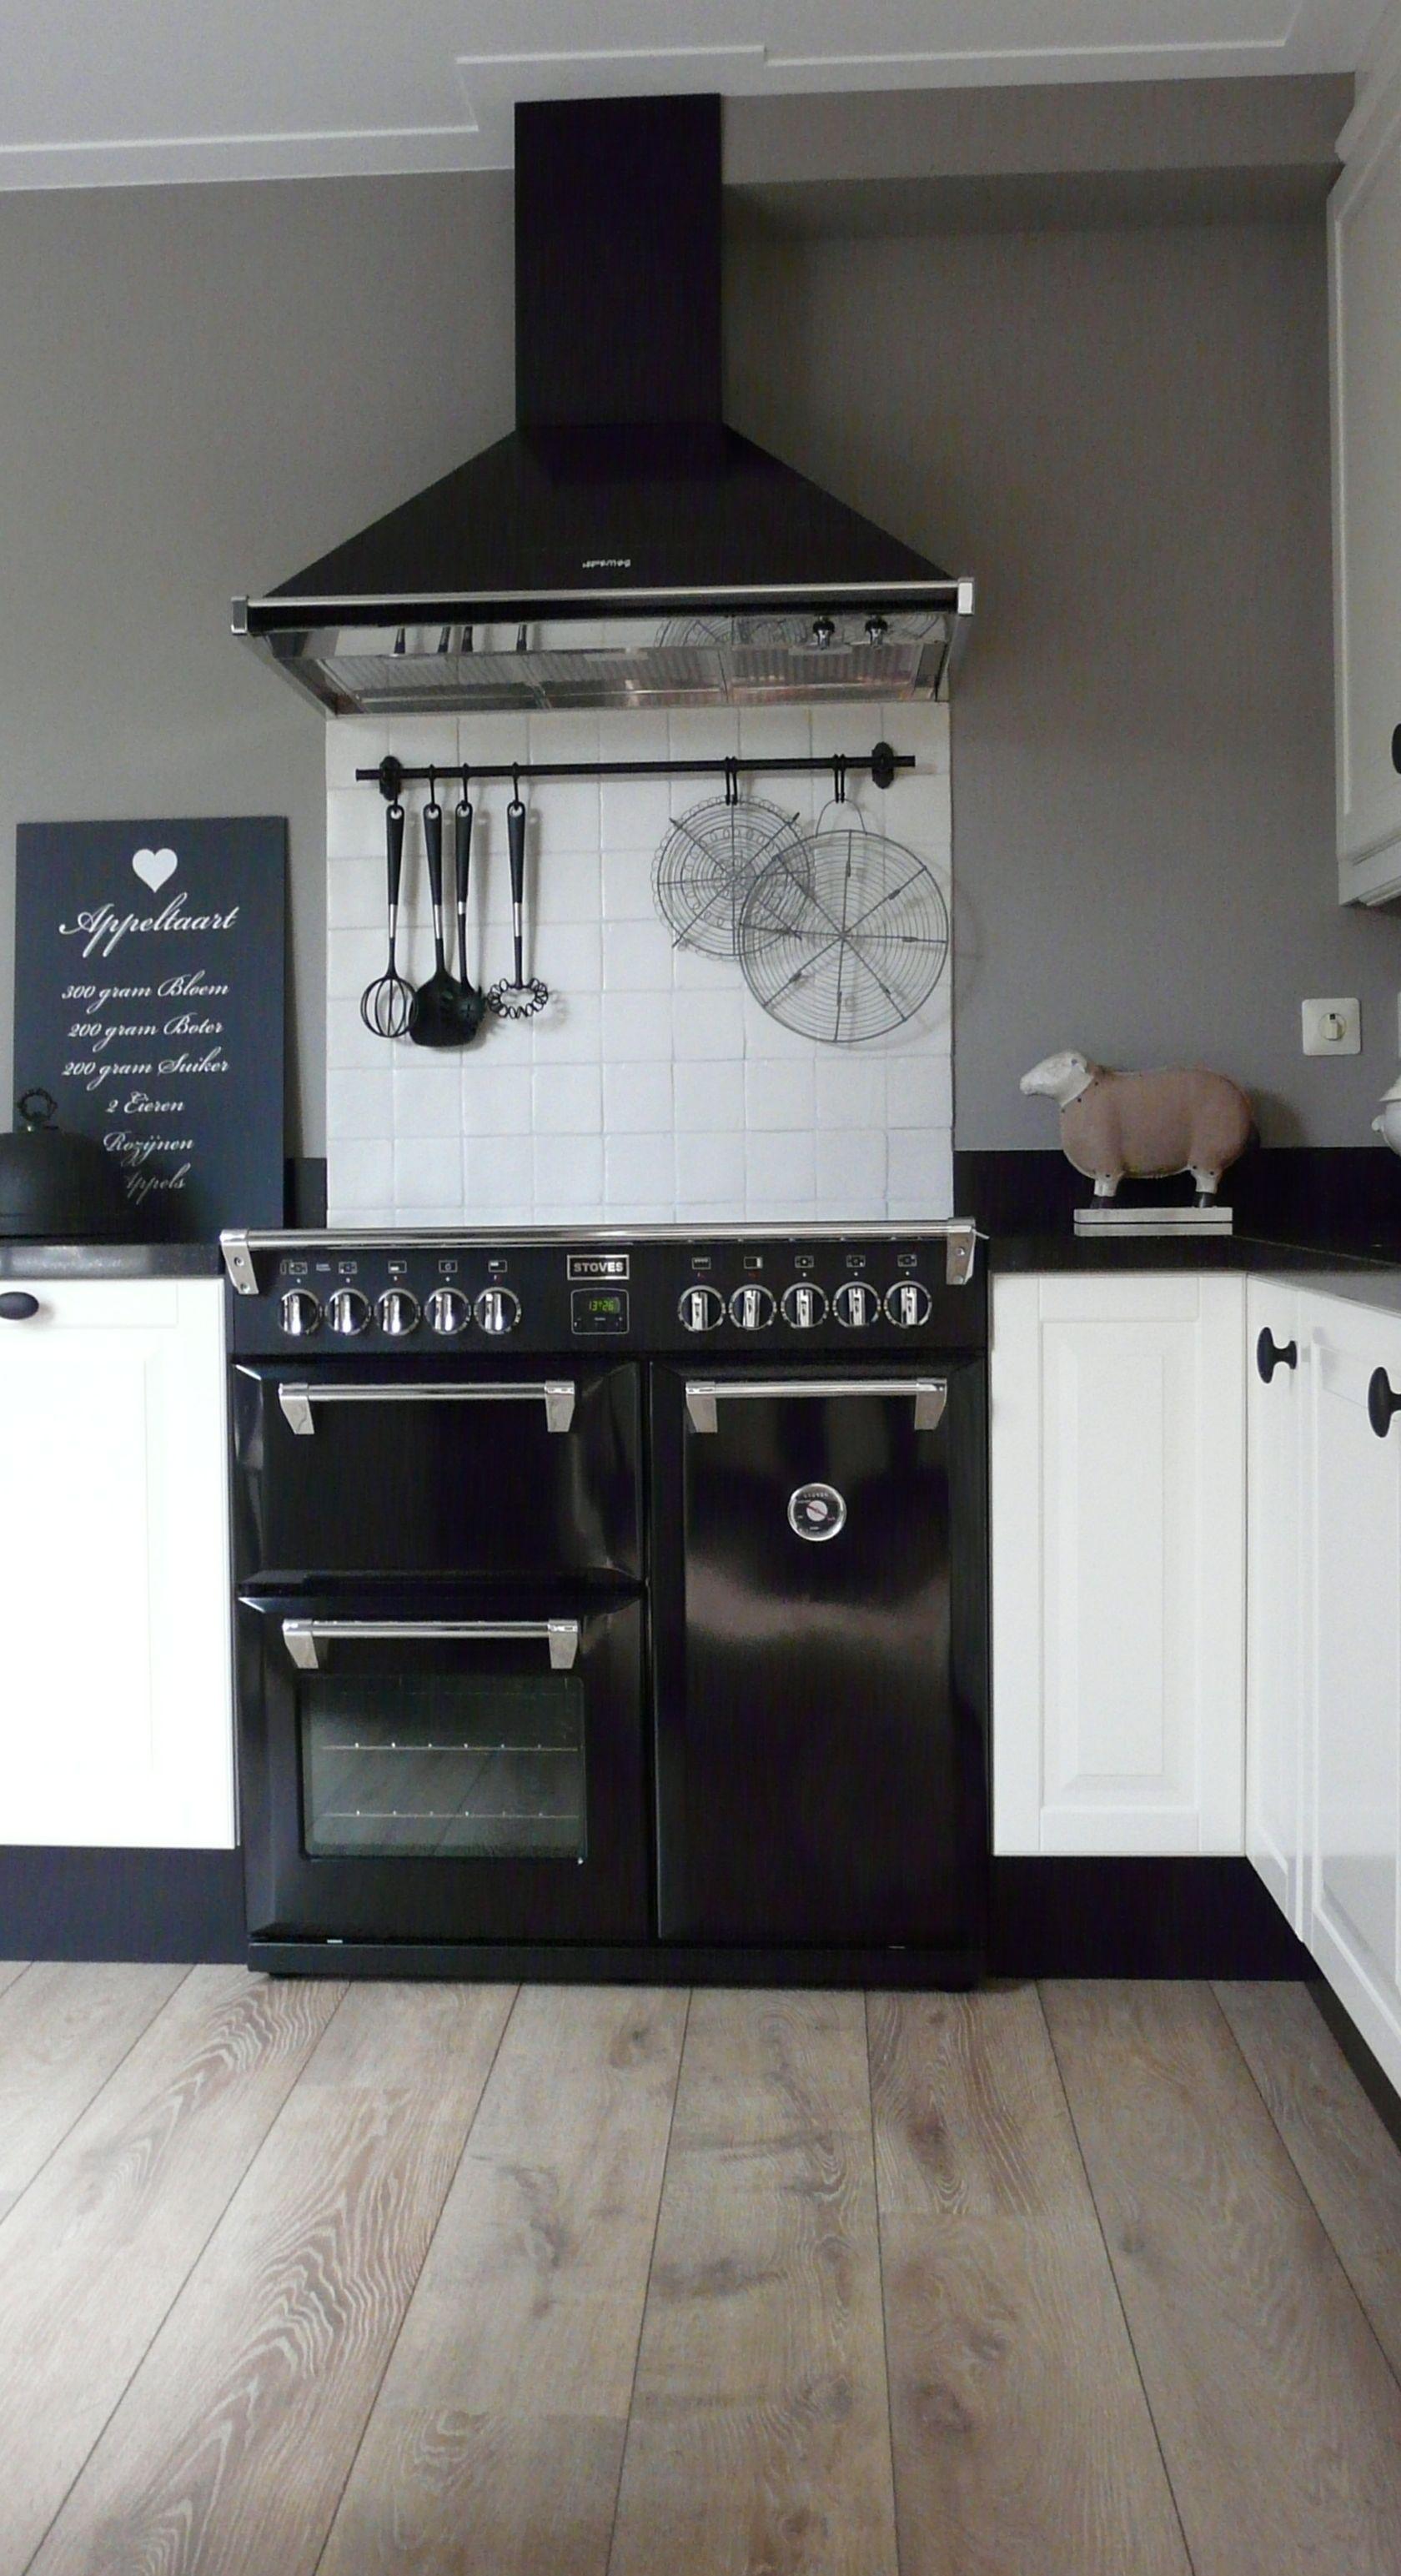 Pin de tatiana marie olympia en kitchens   Pinterest   Decoración ...